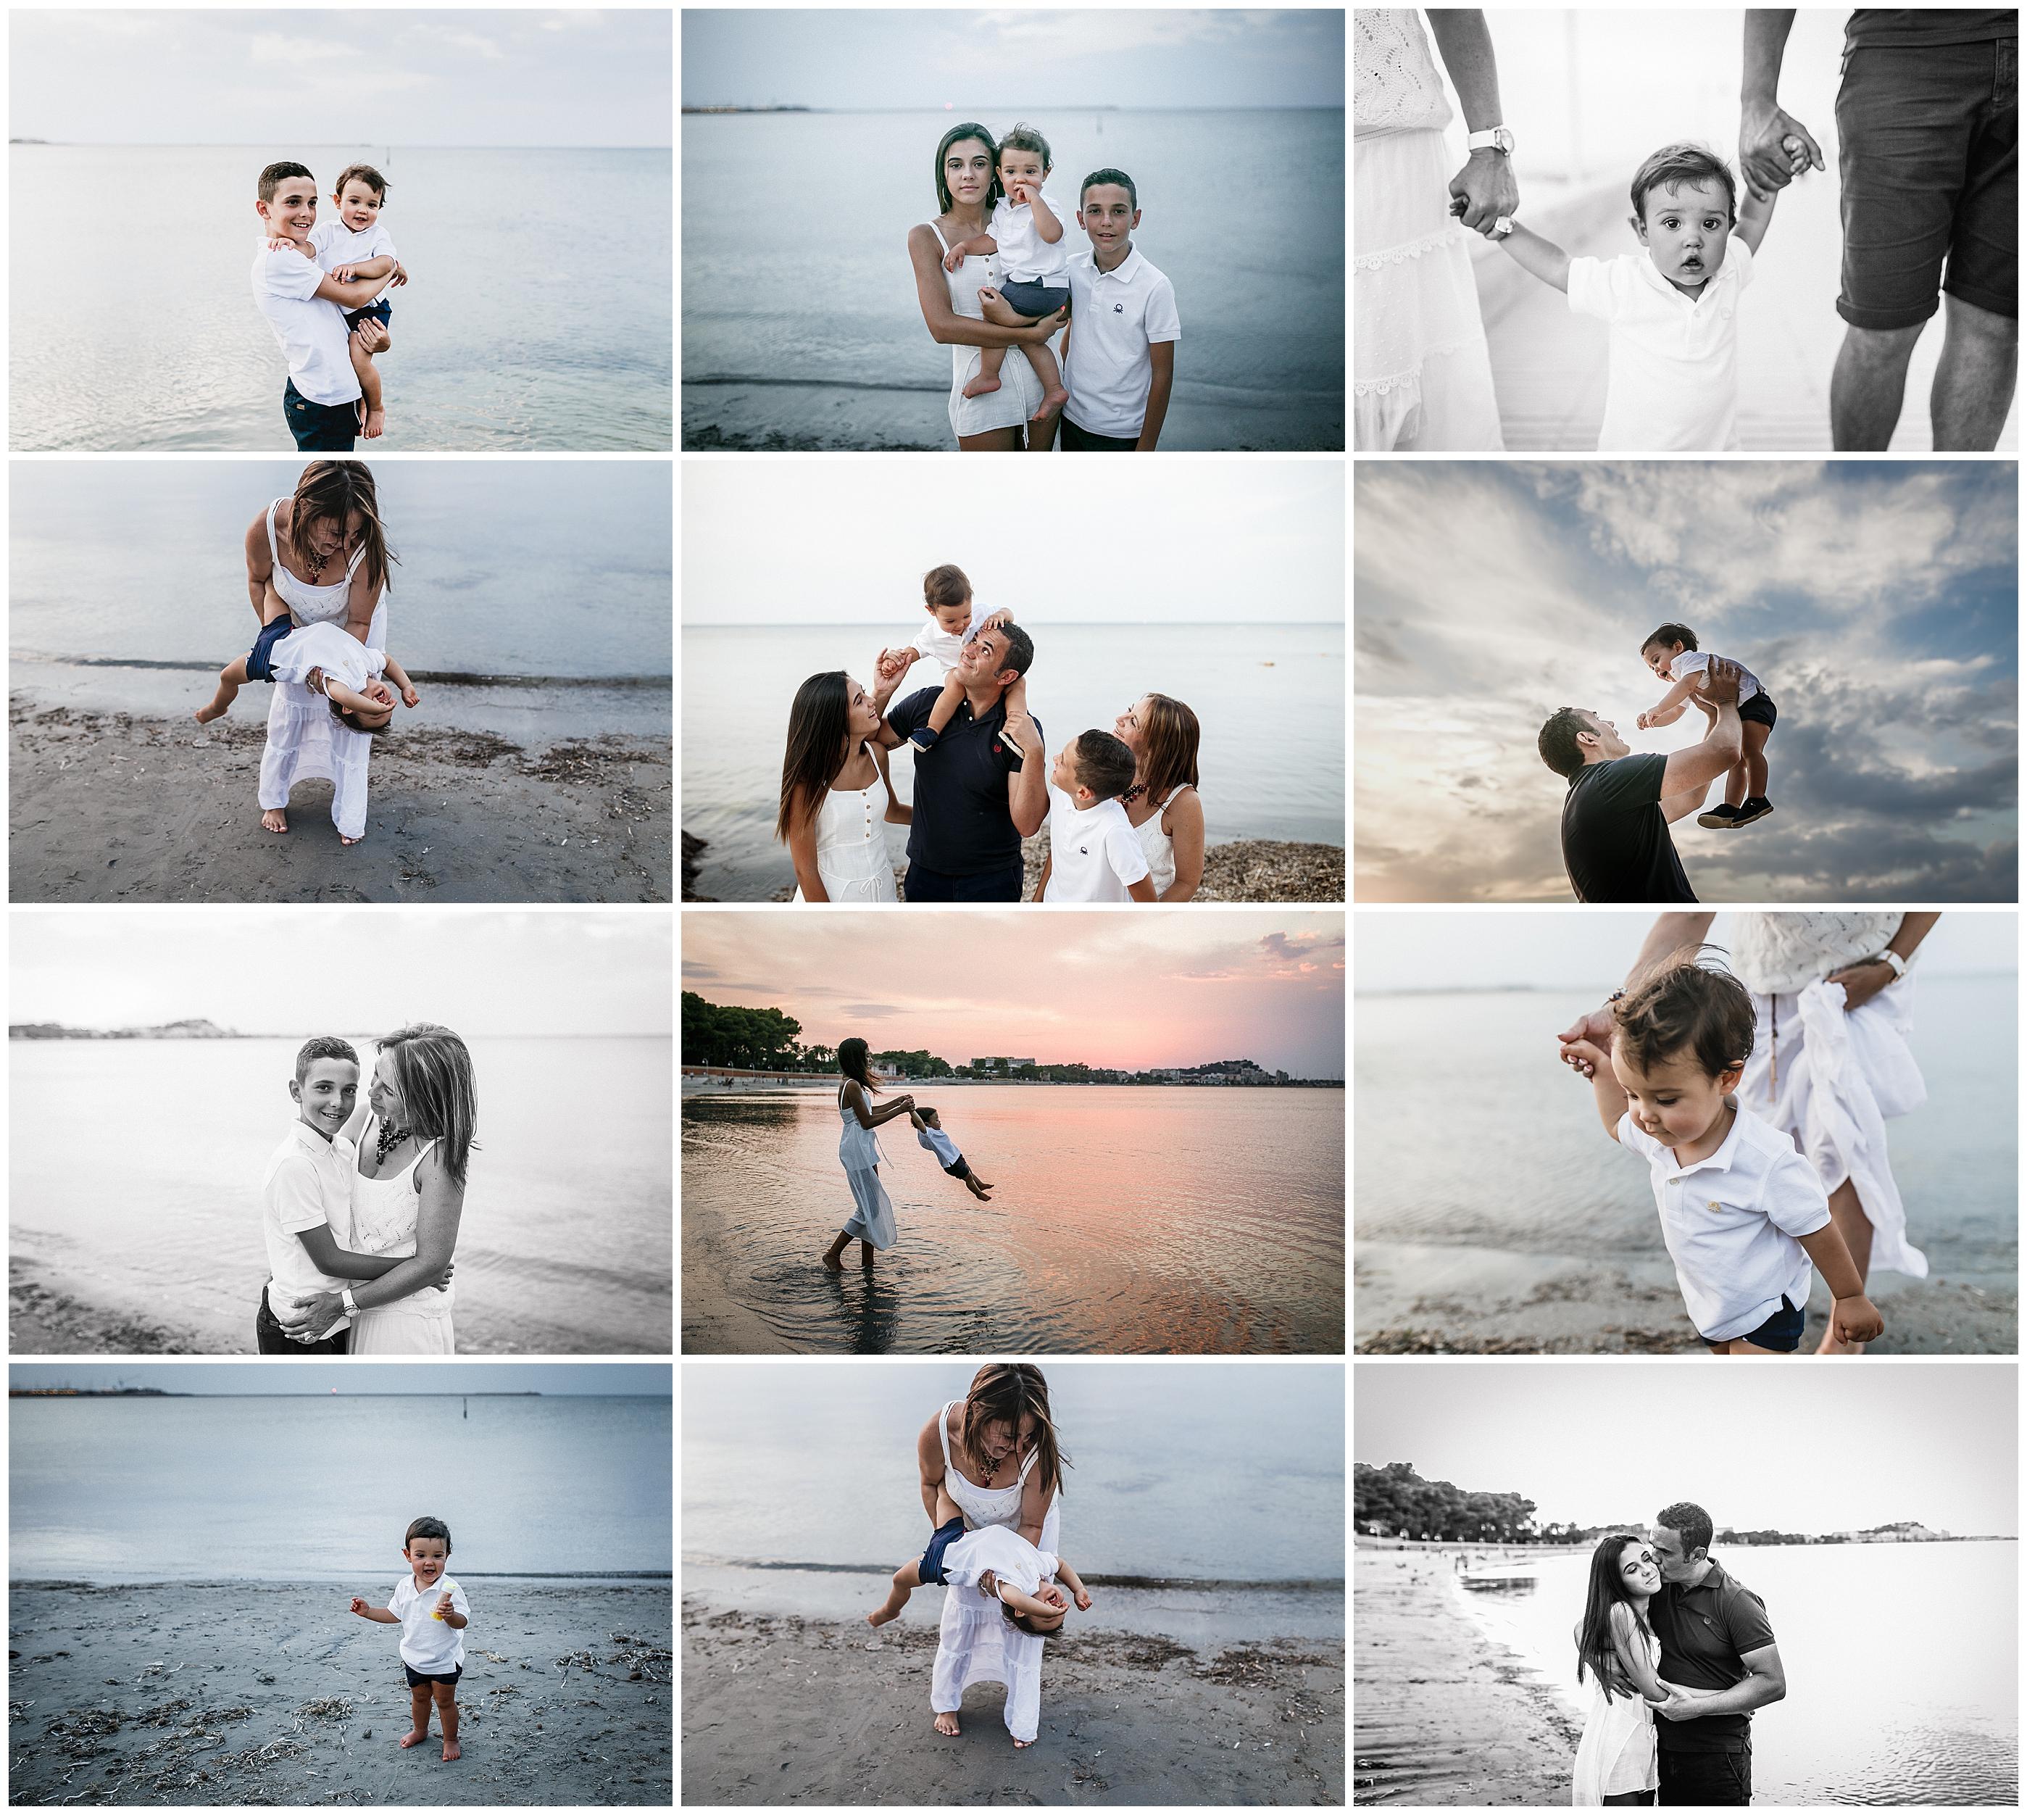 sesion foto valencia playa familia